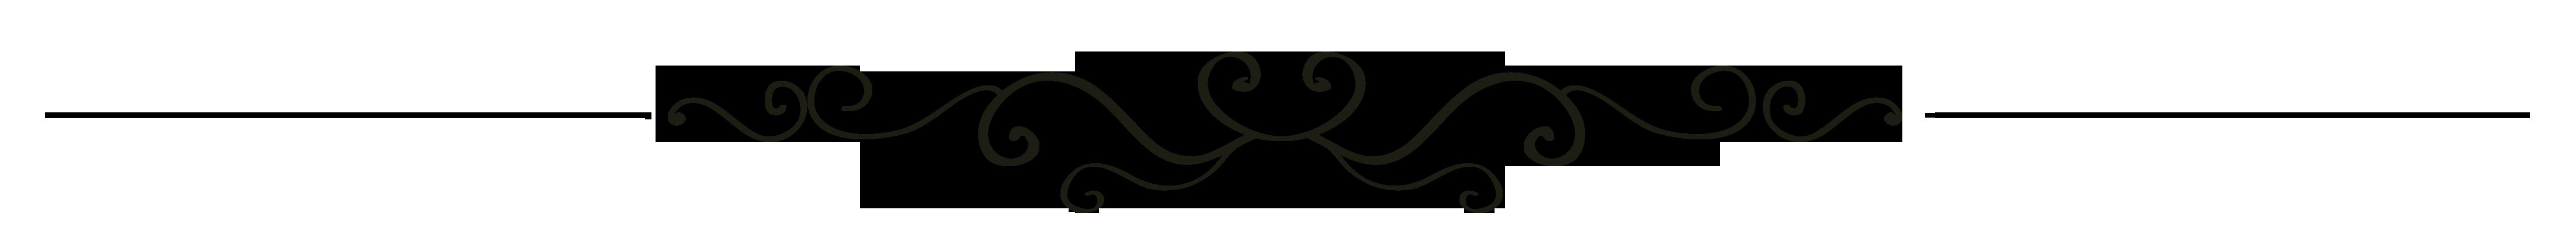 Free Fancy Line Transparent, Download Free Clip Art, Free Clip Art.